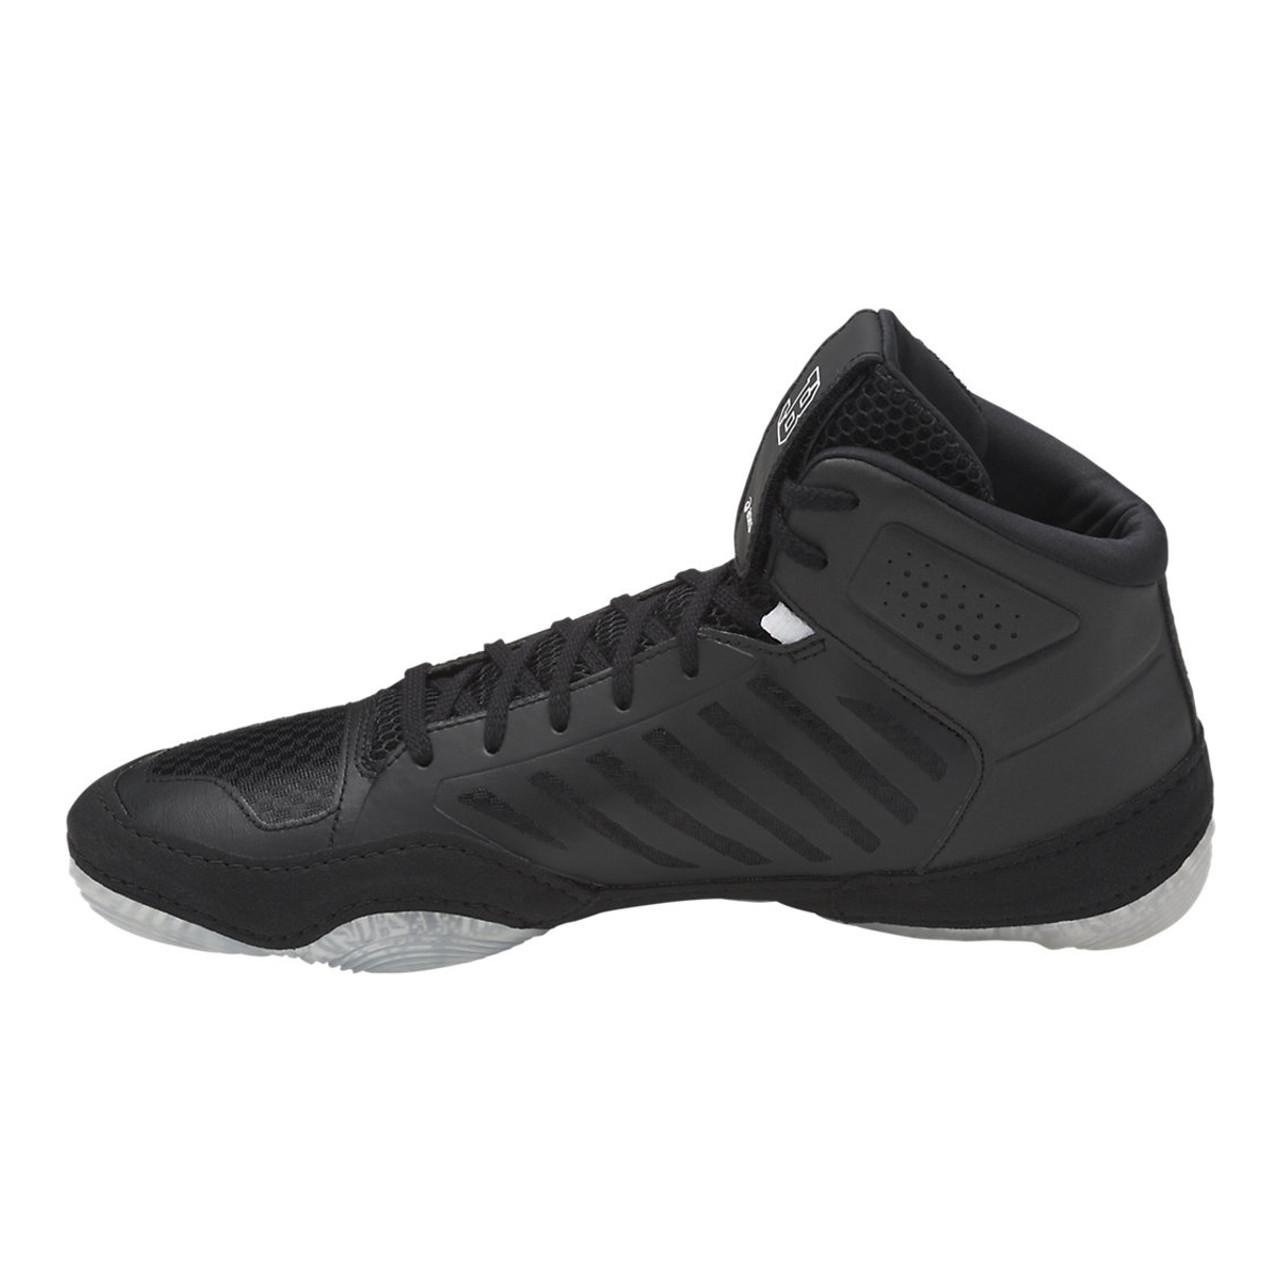 separation shoes 1237c 4b176 ... Asics JB Elite III Men s Wrestling Shoes ...